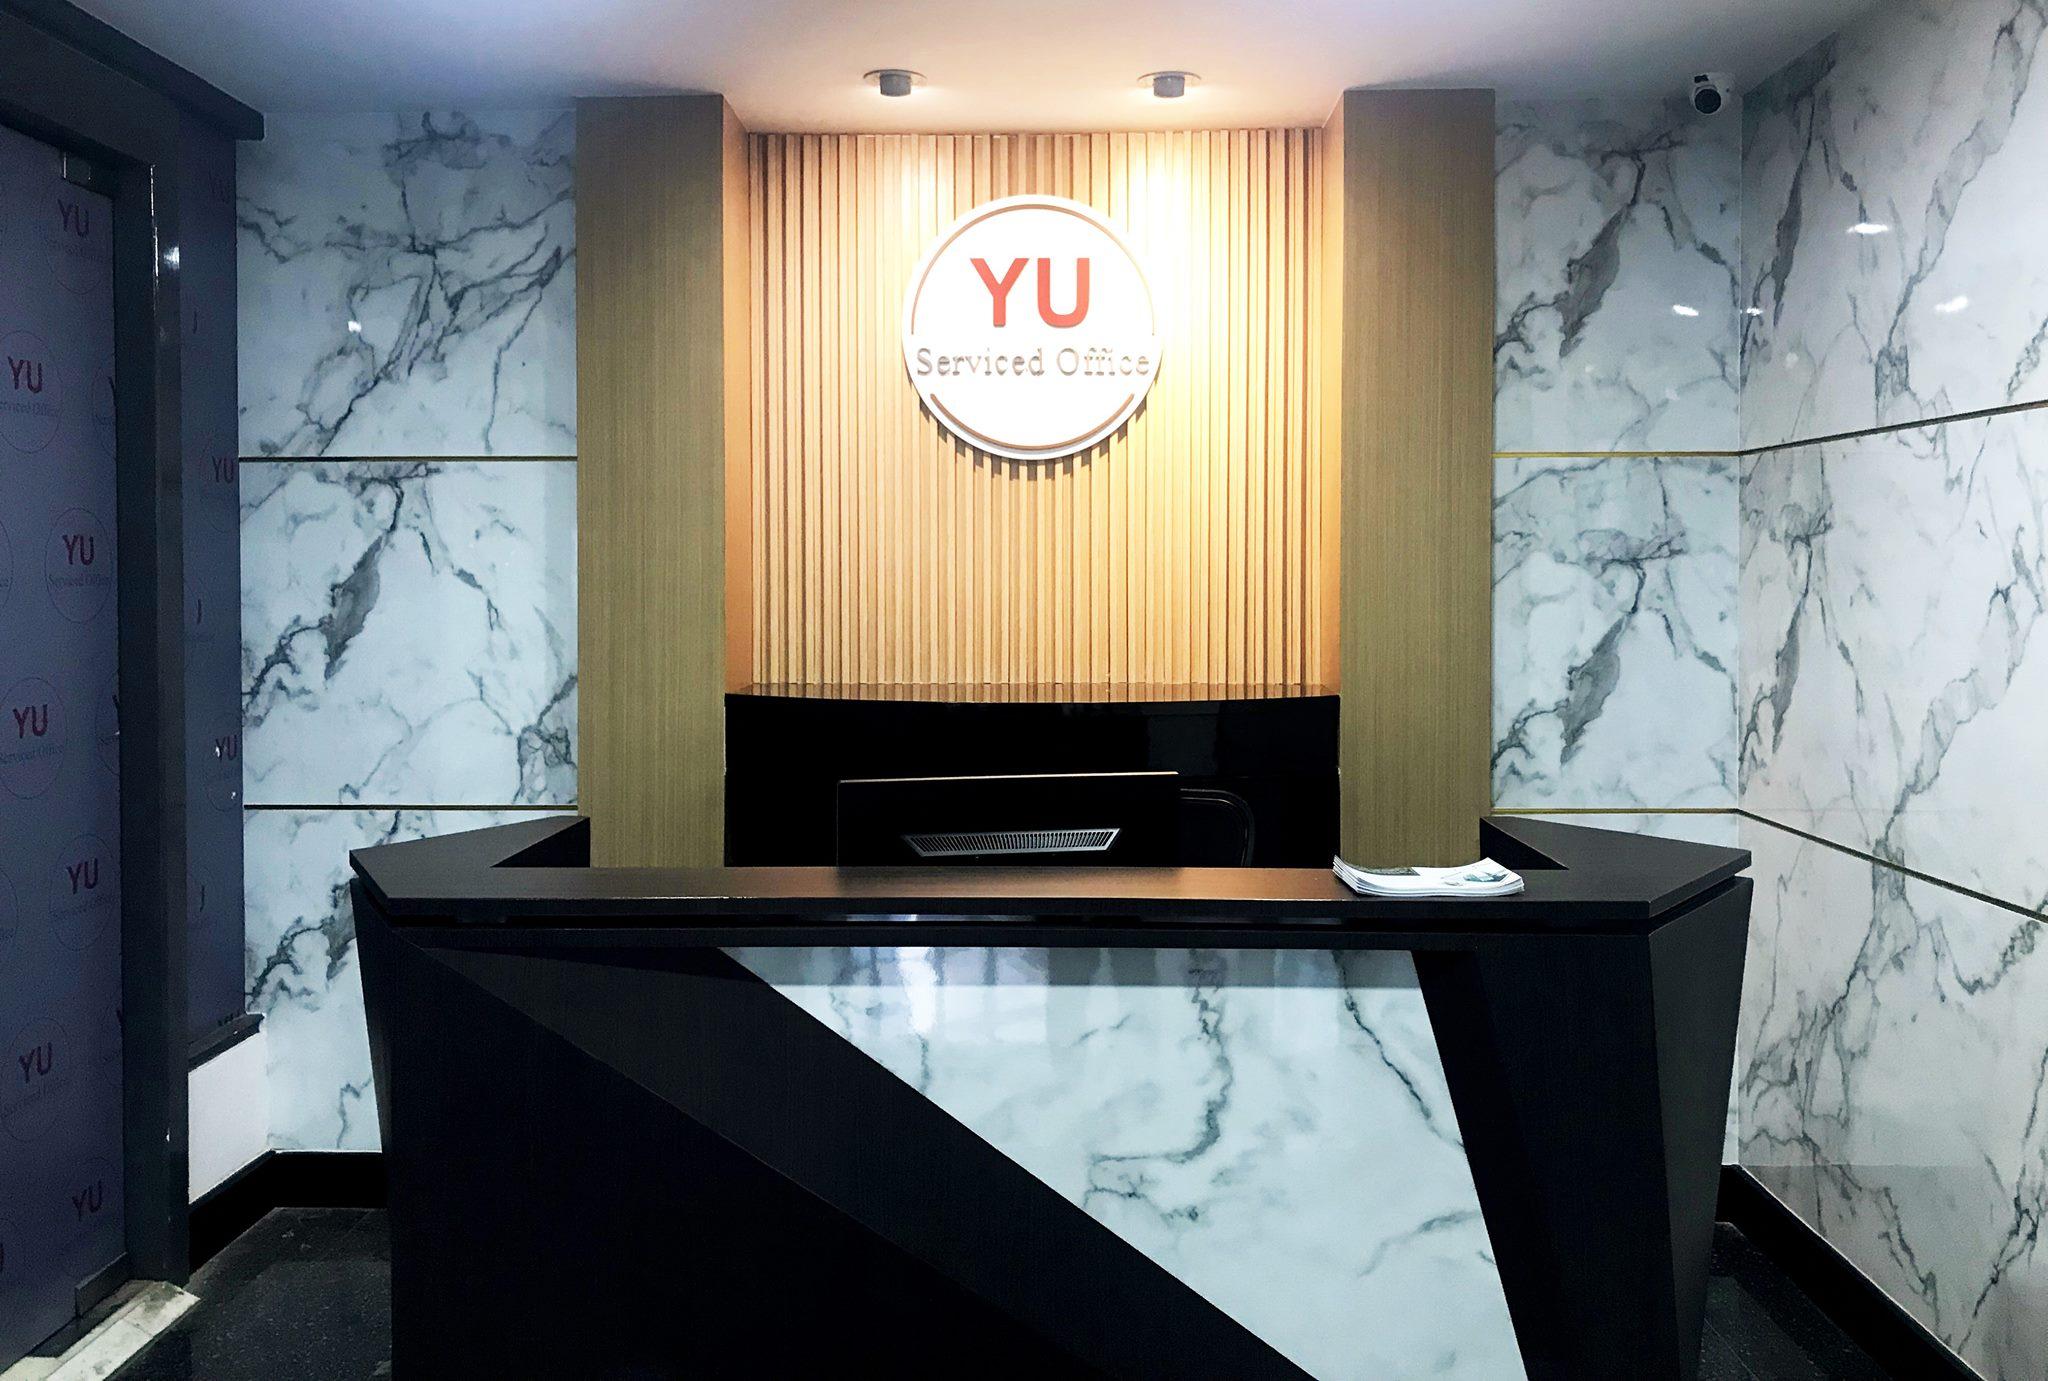 Yu Serviced Office, Bangkok